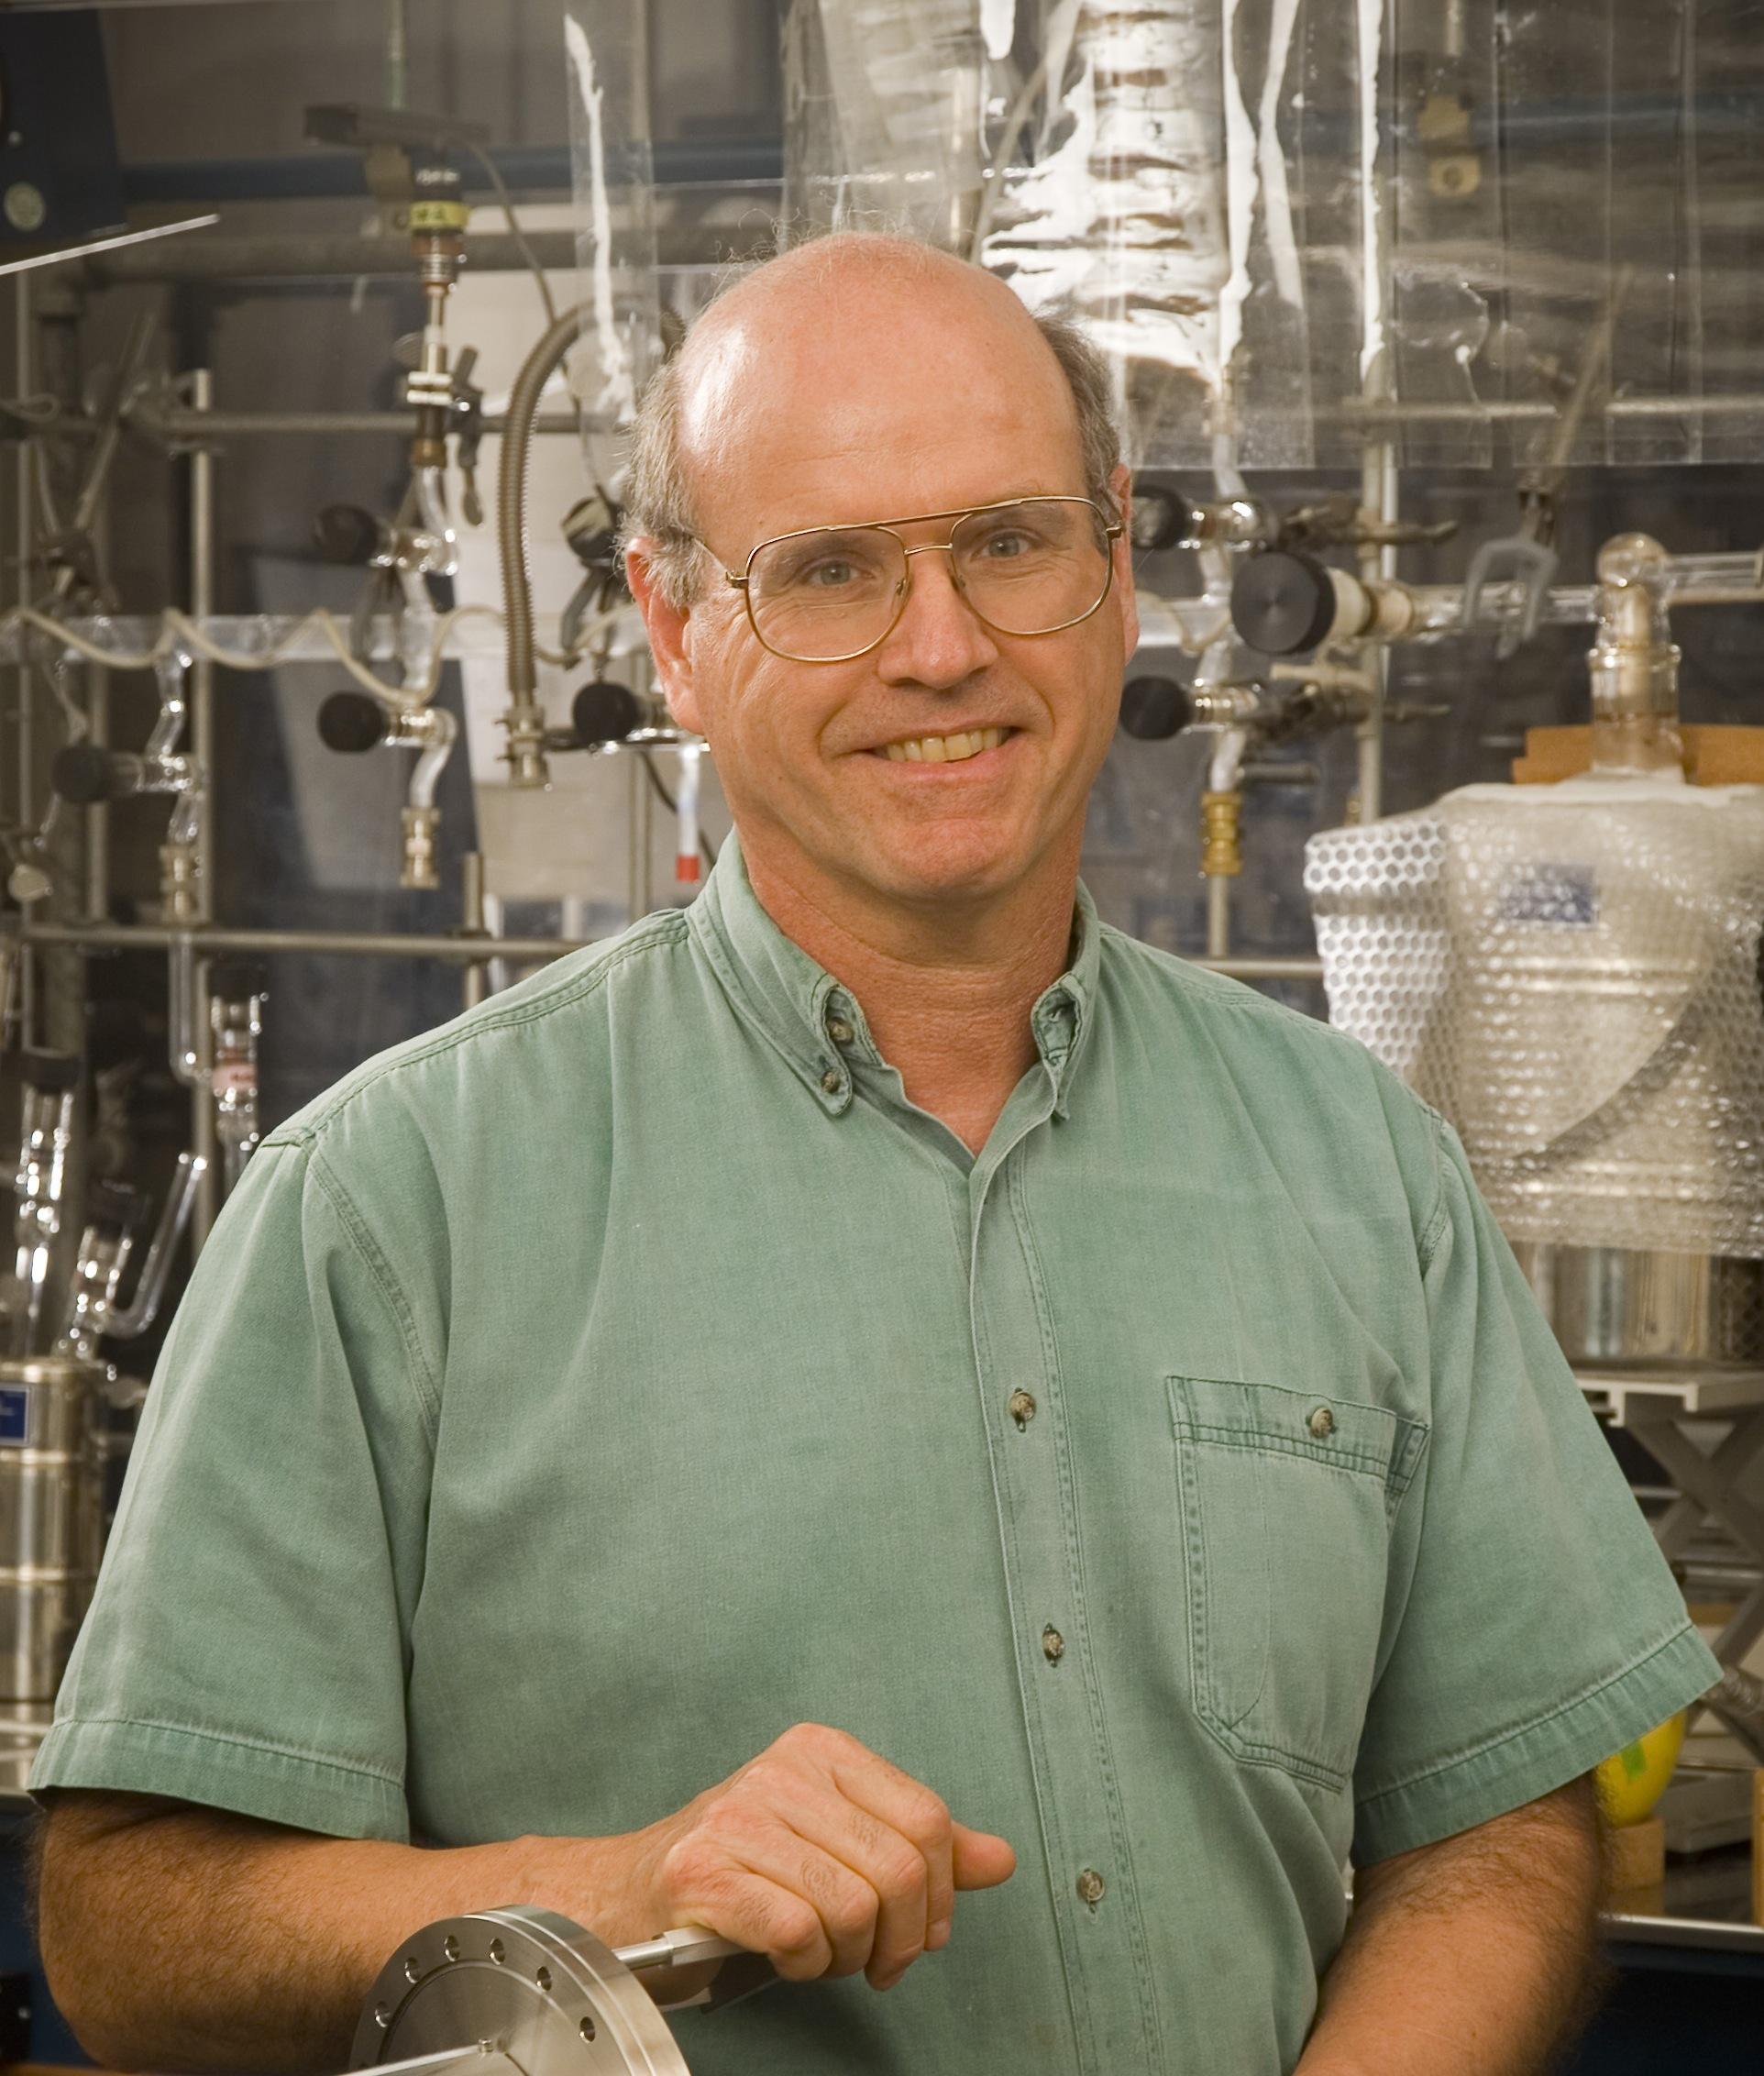 Louis Allamandola, Space Chemist